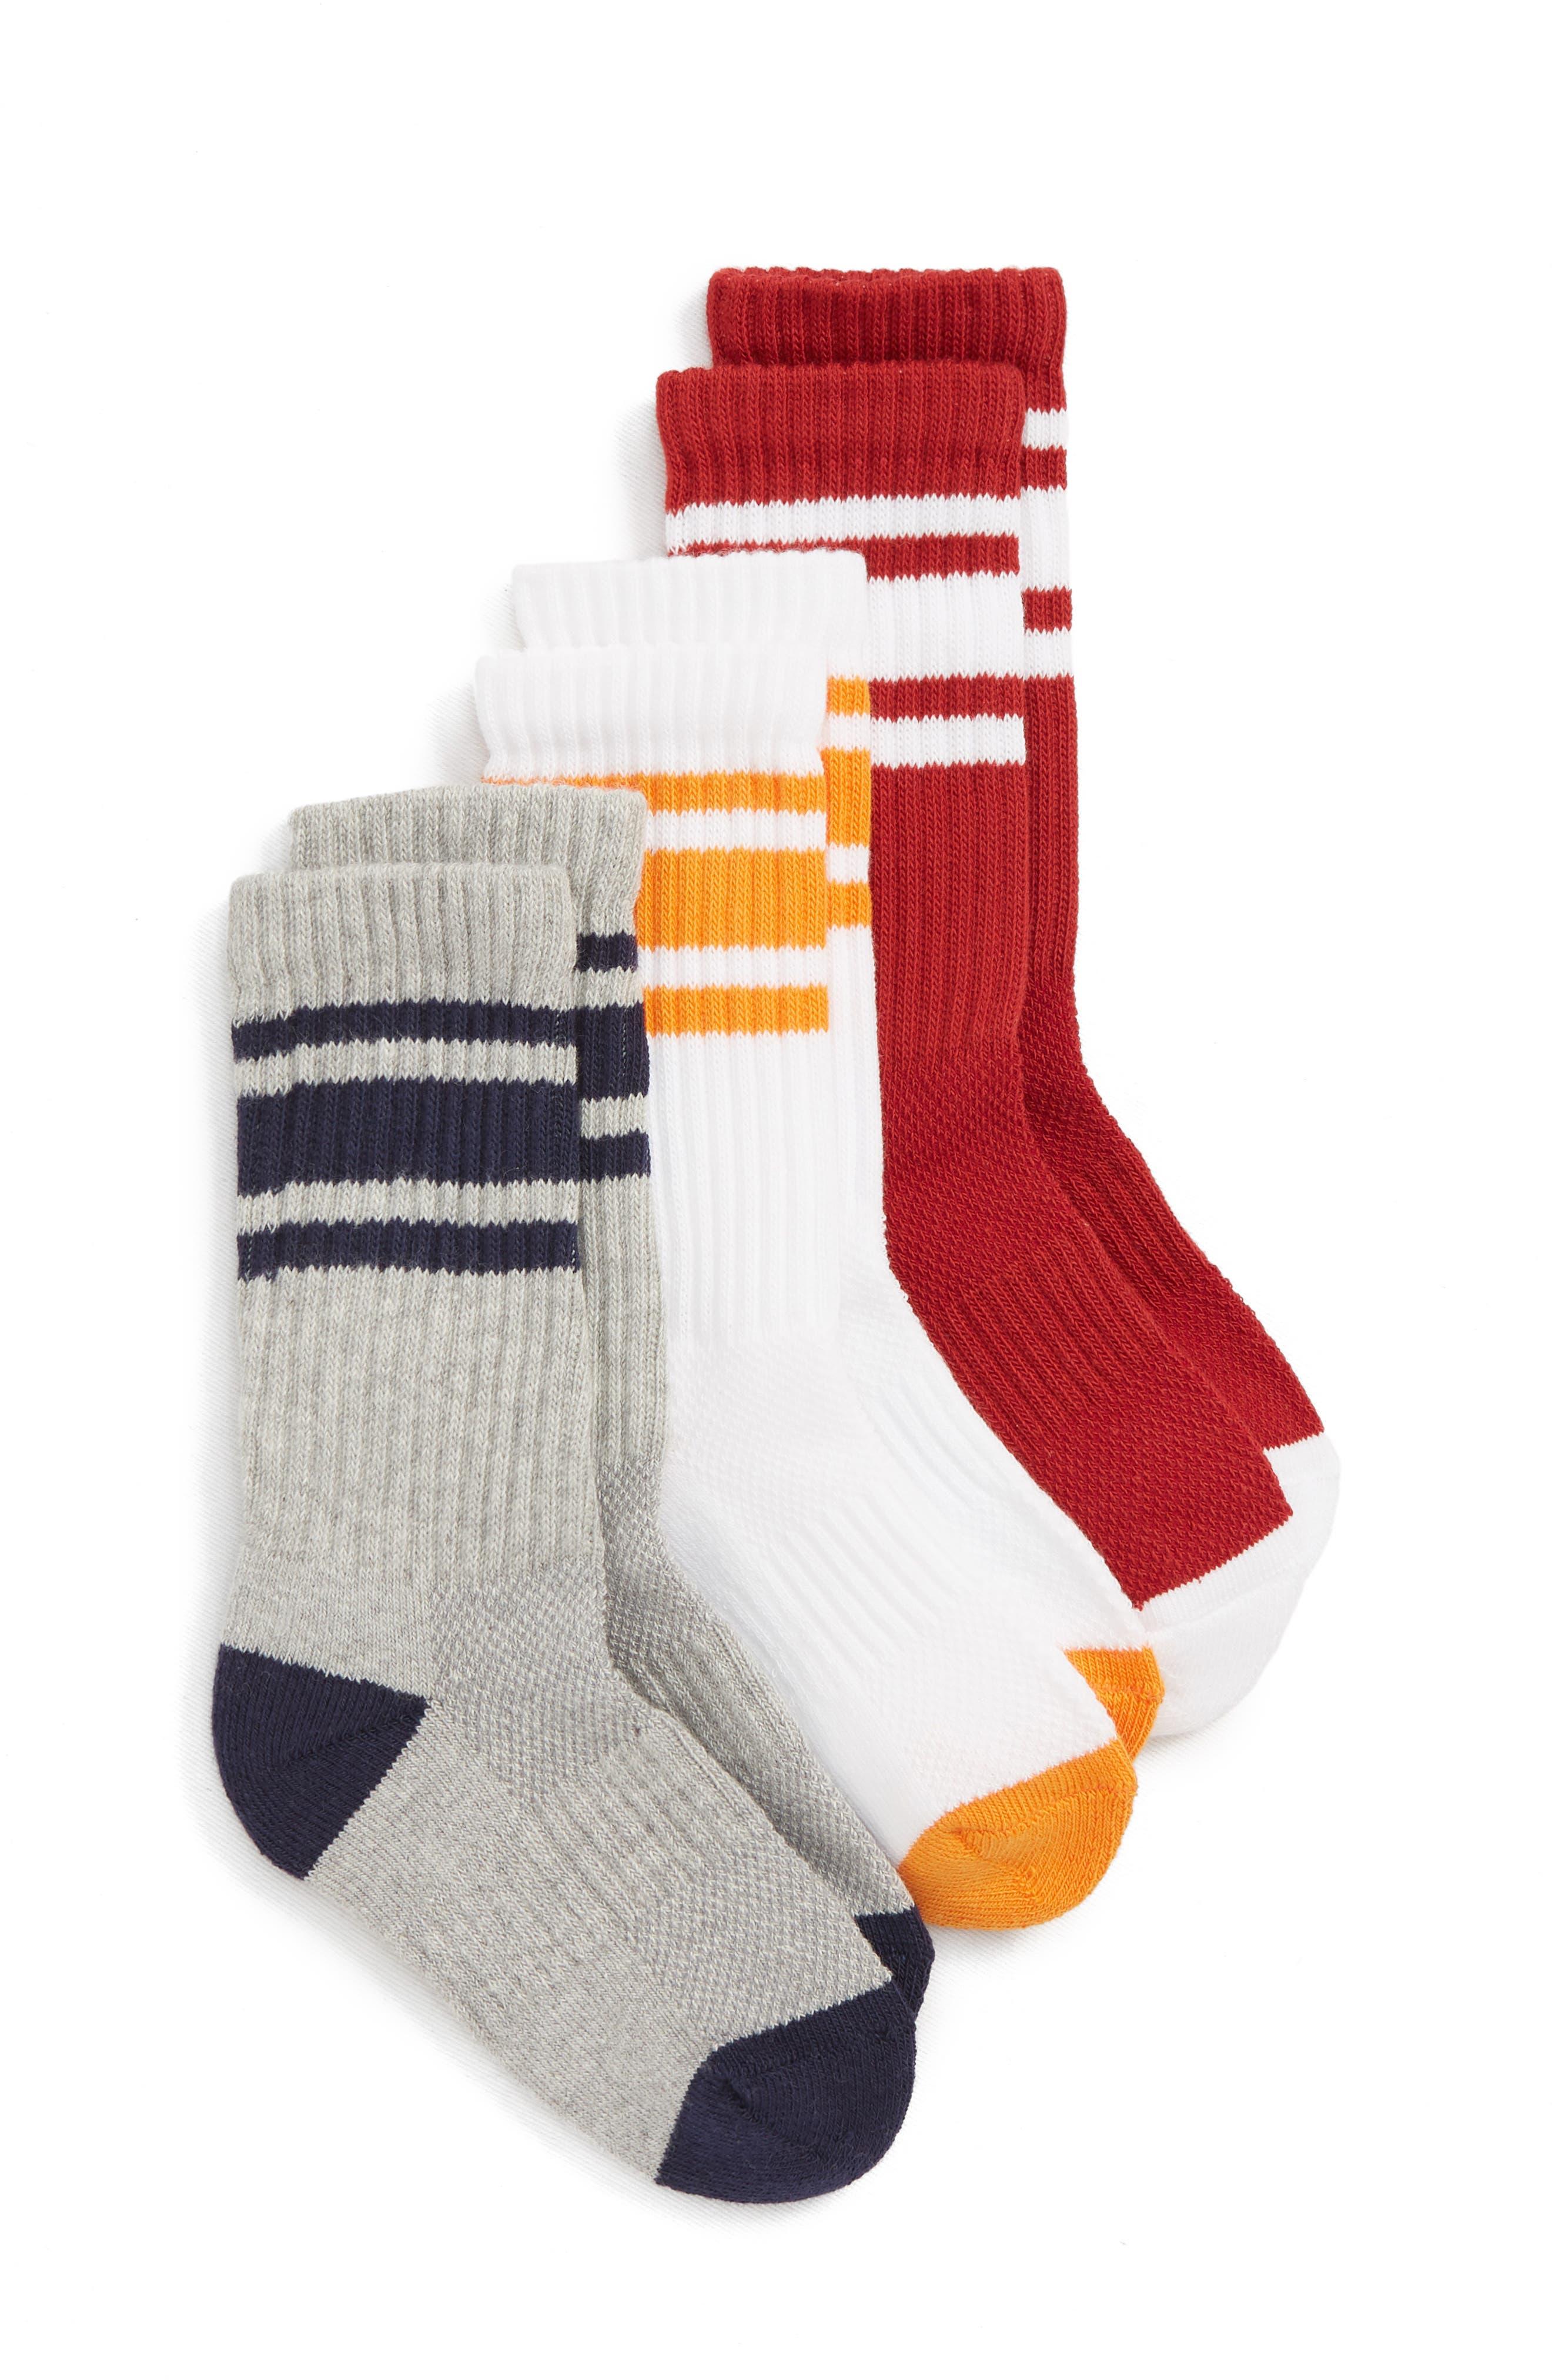 3-Pack Tube Socks,                         Main,                         color, NAVY PEACOAT MULTI